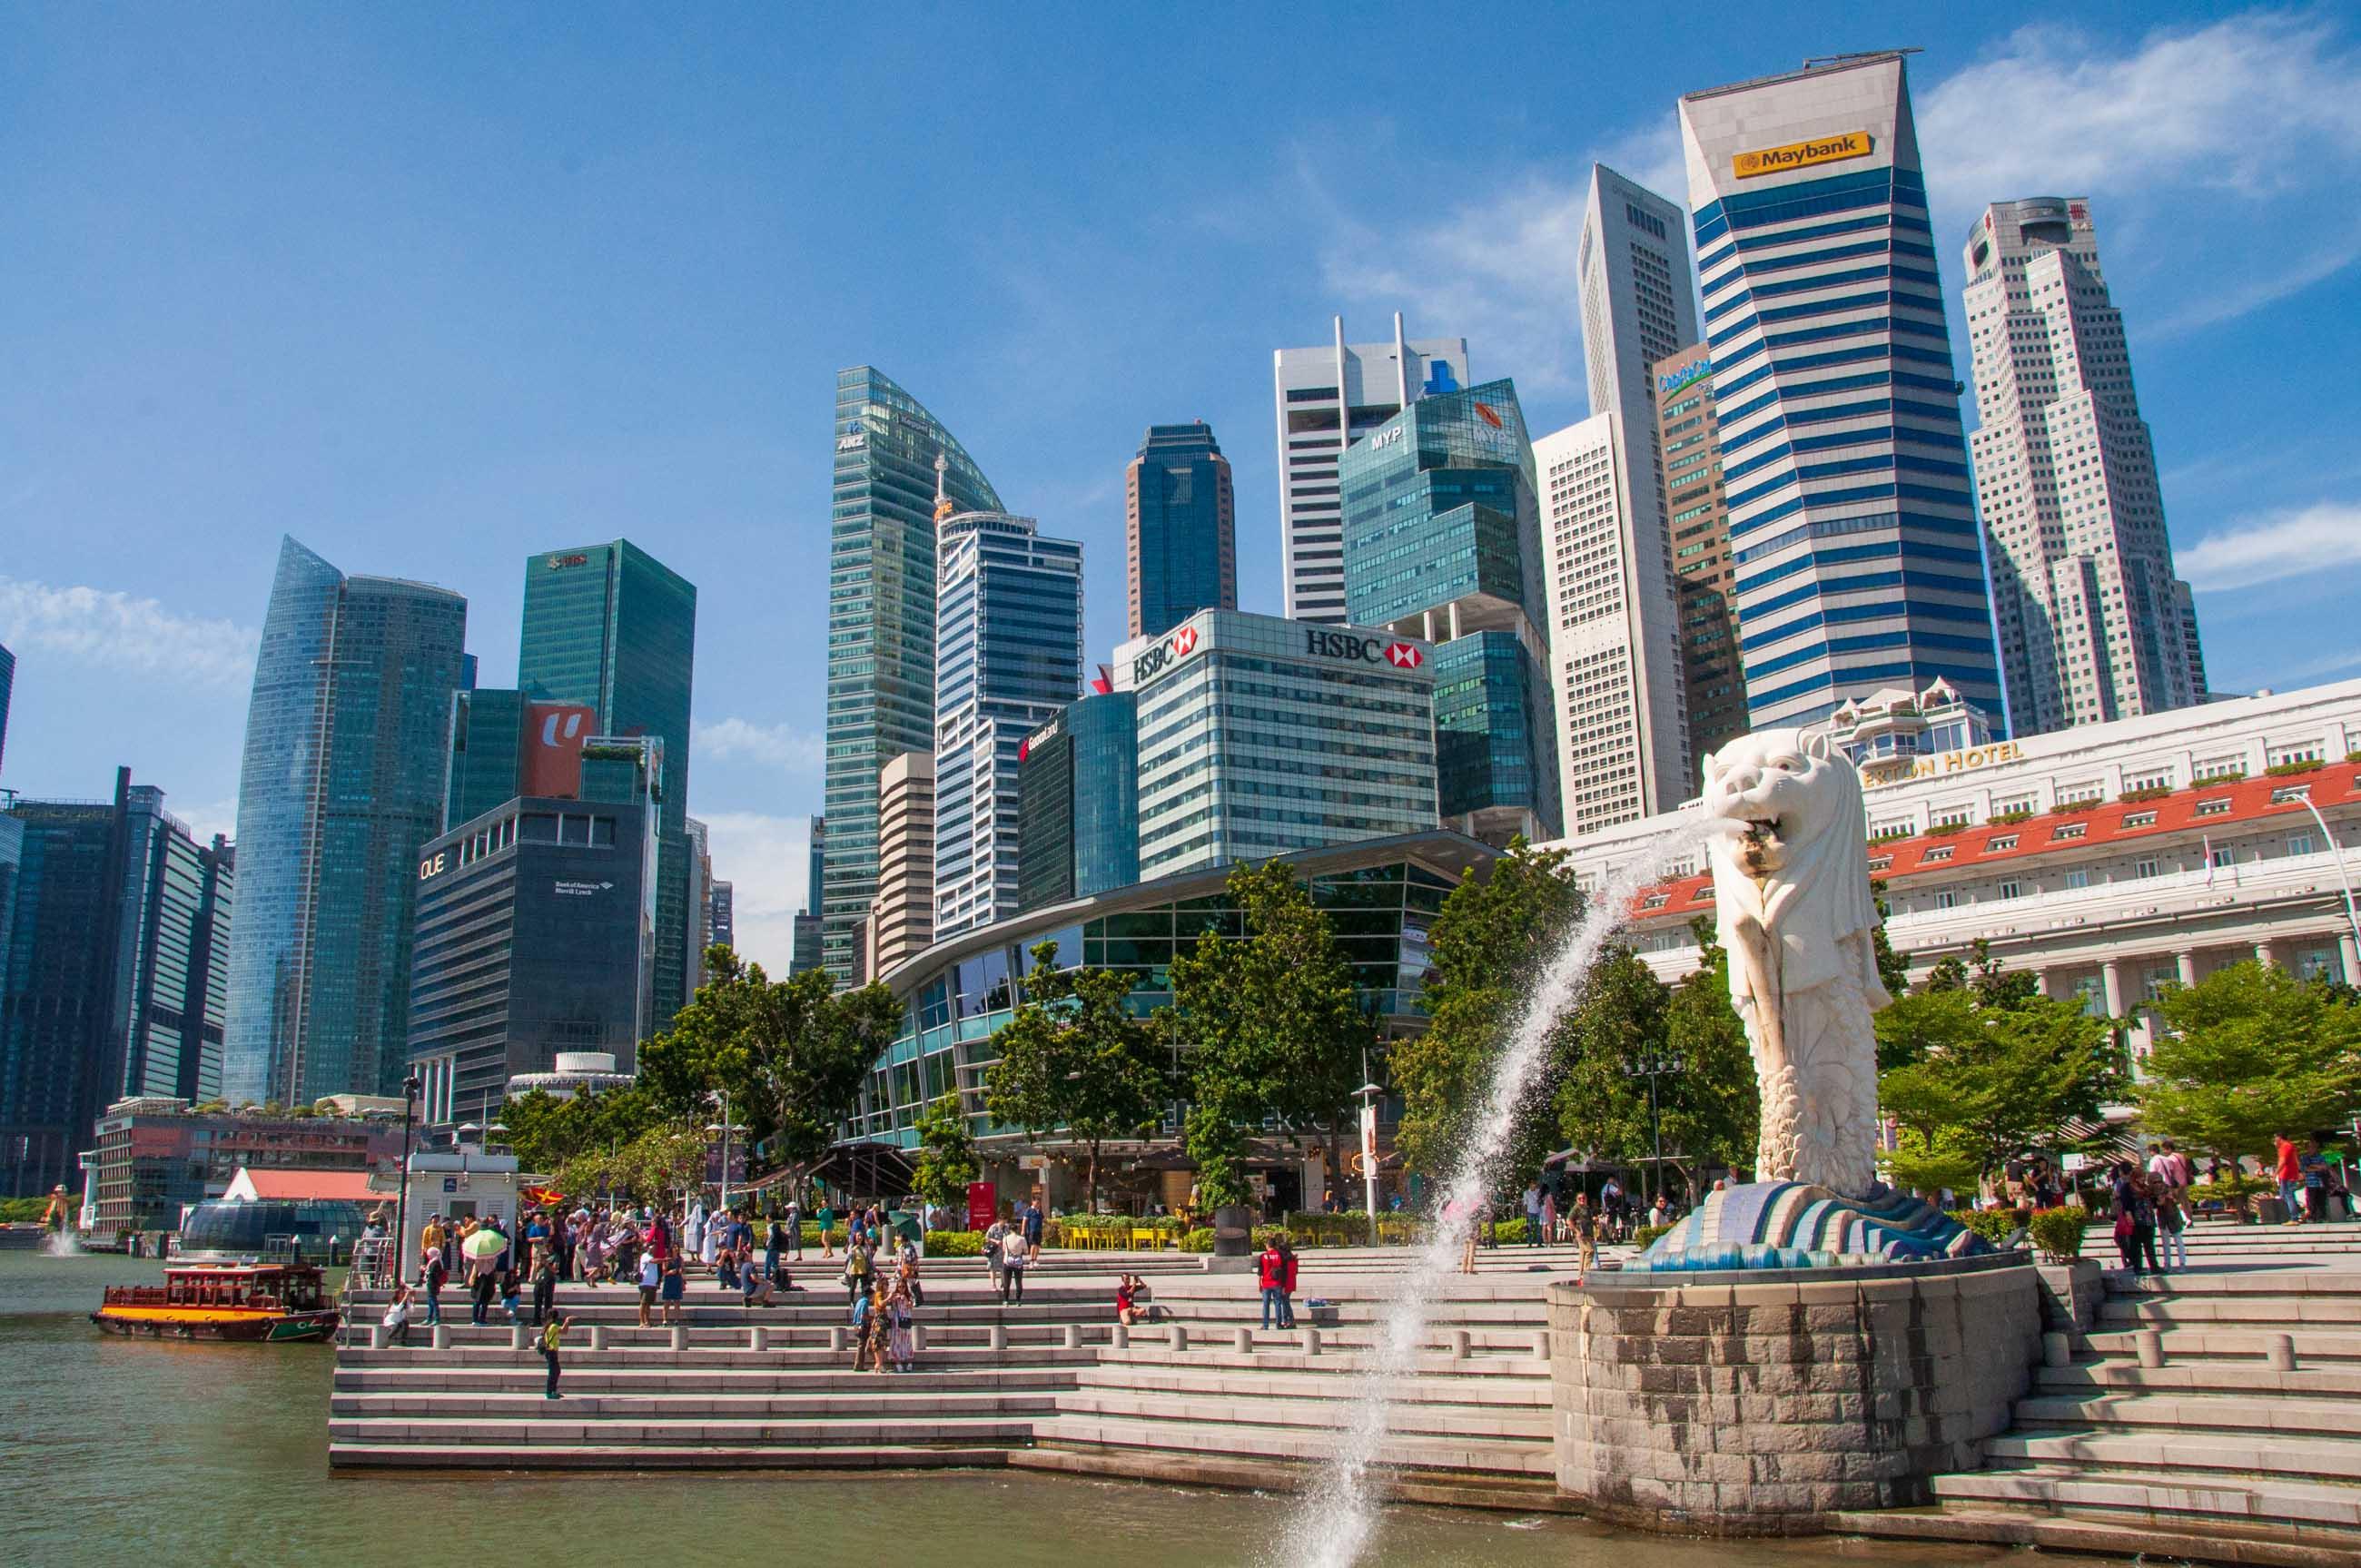 https://bubo.sk/uploads/galleries/5062/tomaskubus_singapur_tms_downtown.jpg